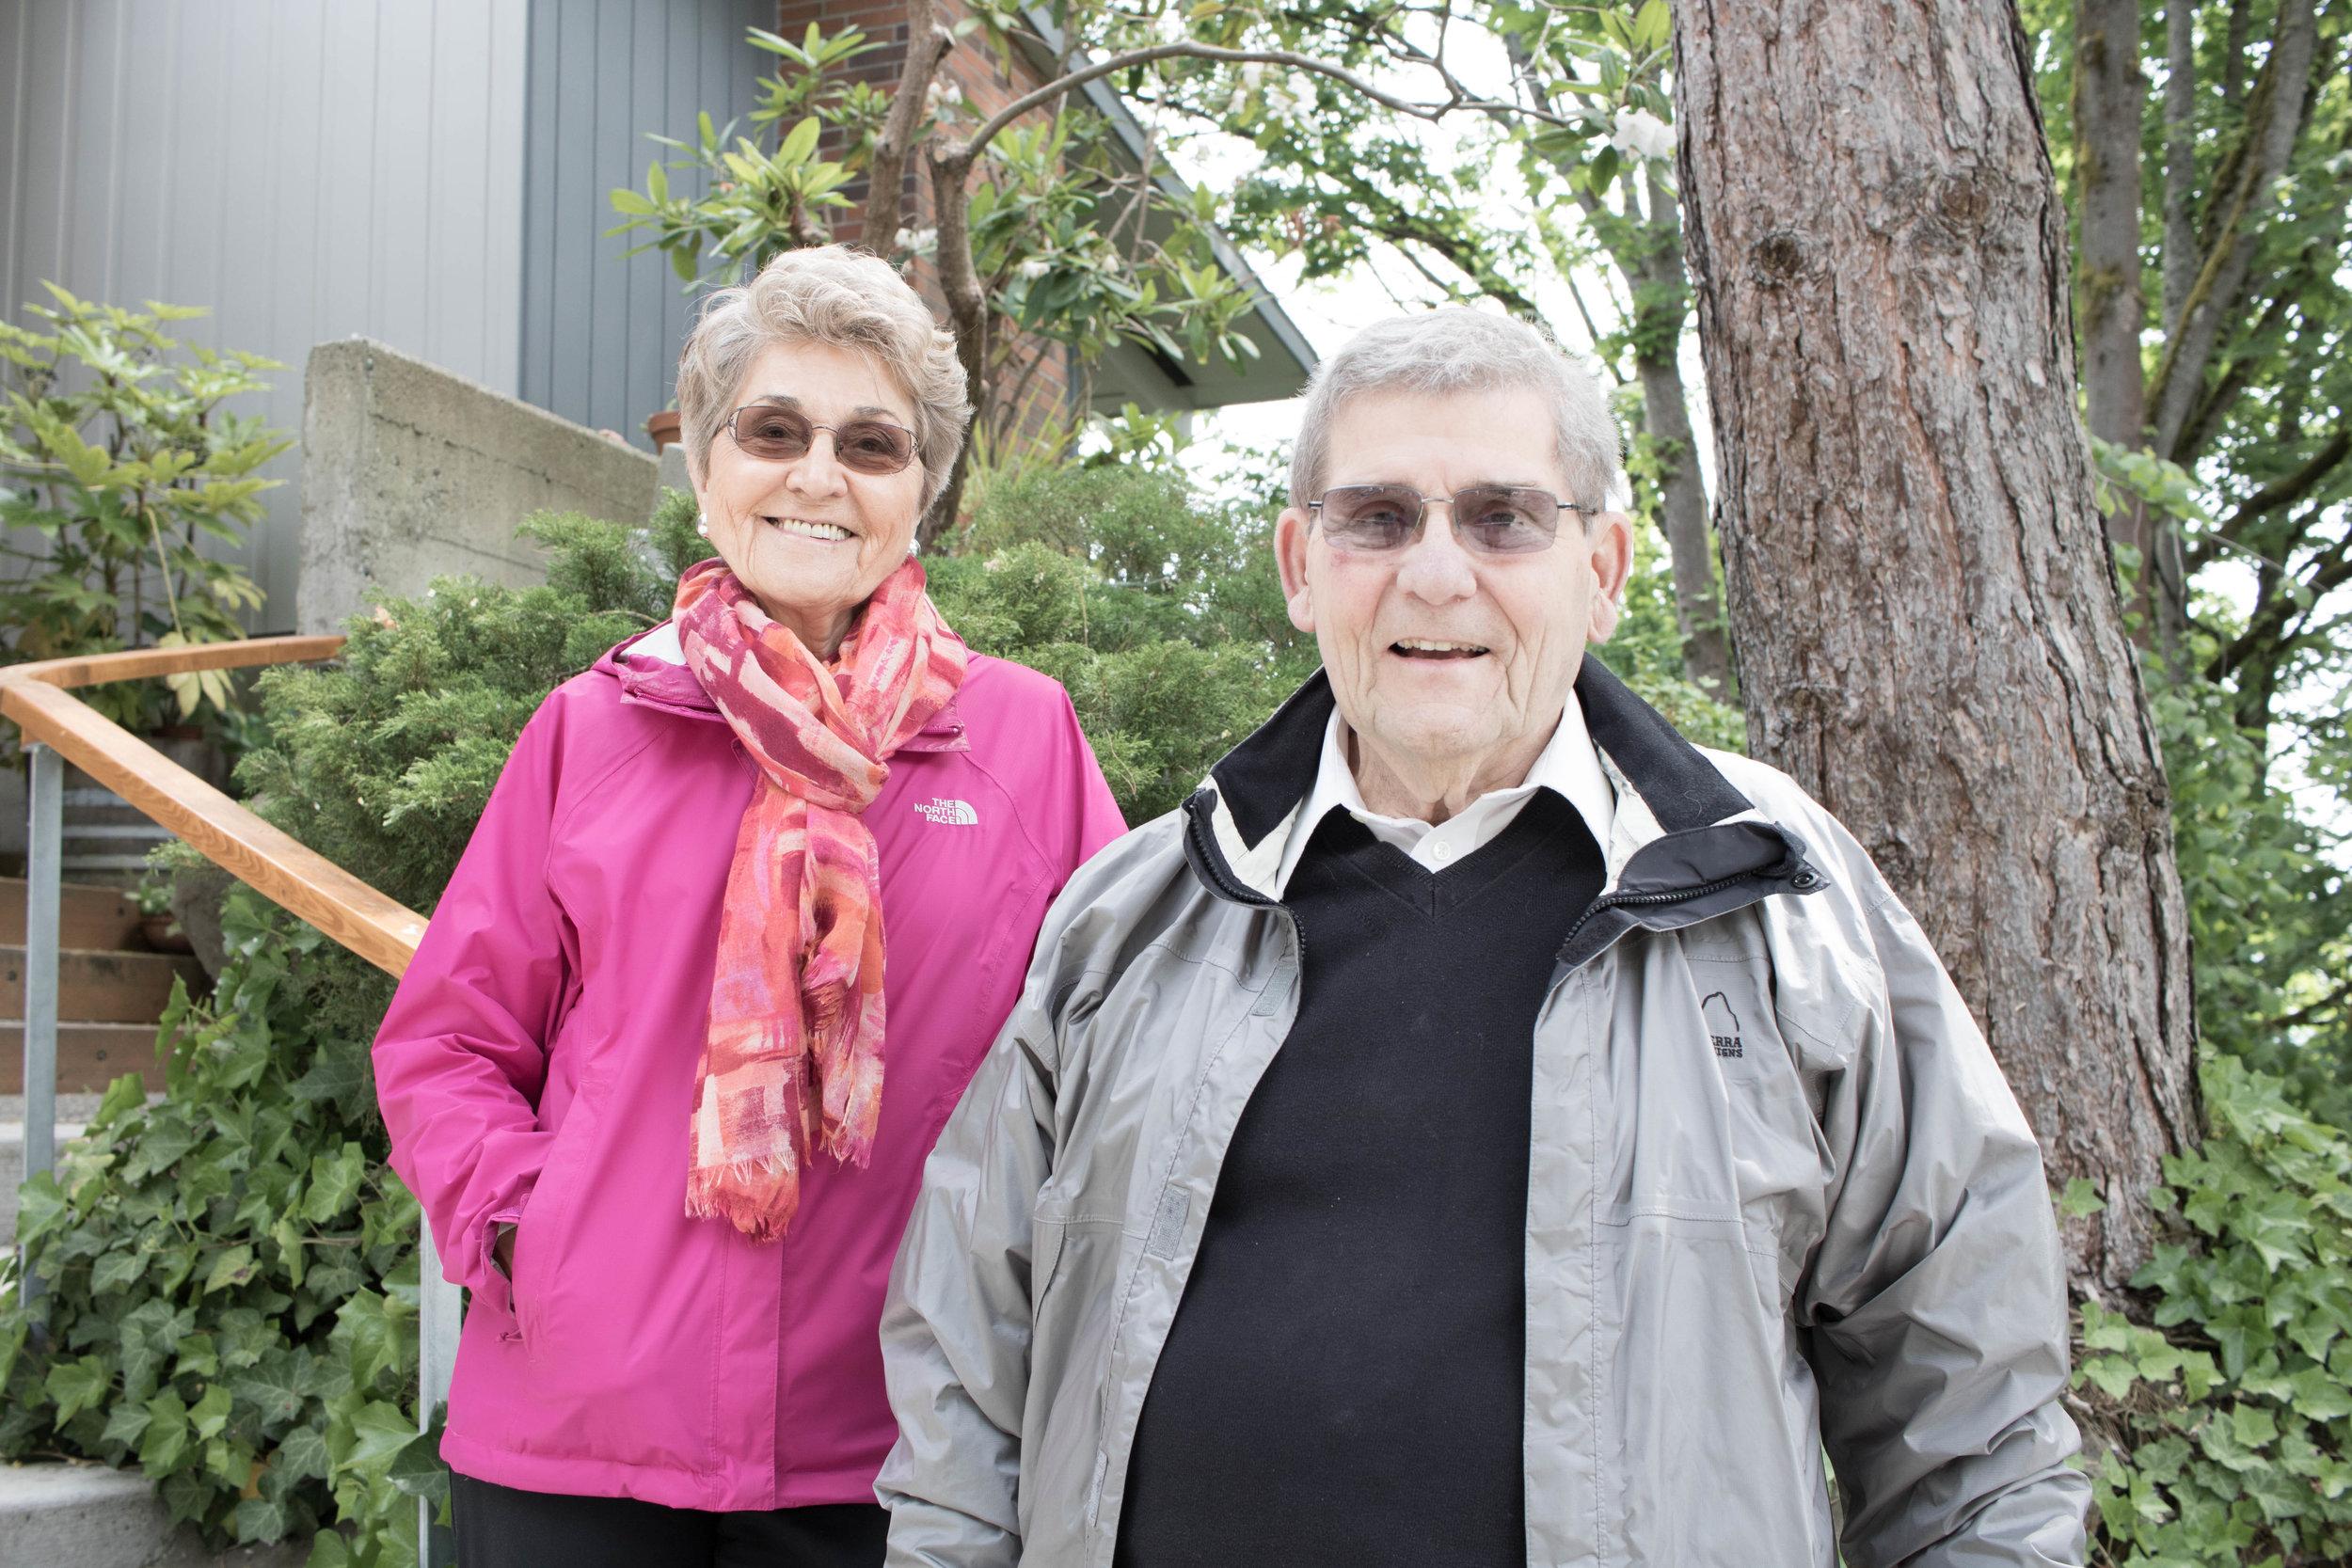 Joan and Ed Singler by Jill Freidberg